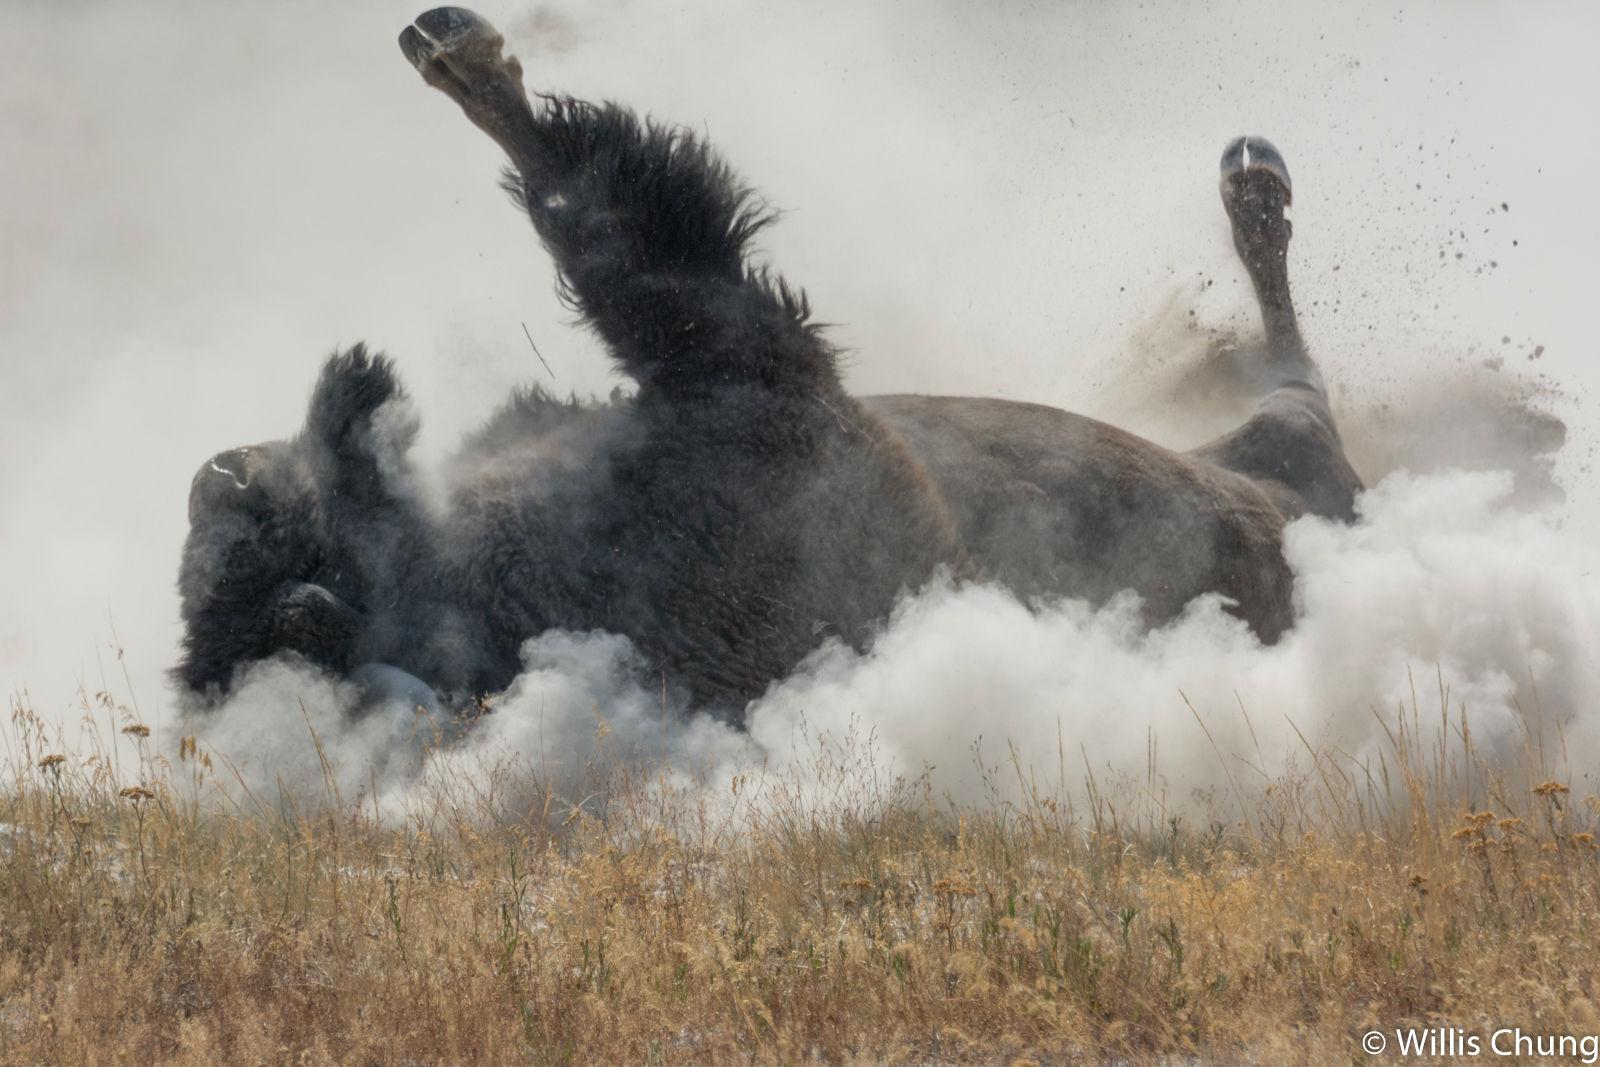 Chung Yellowstone Bull 7 image